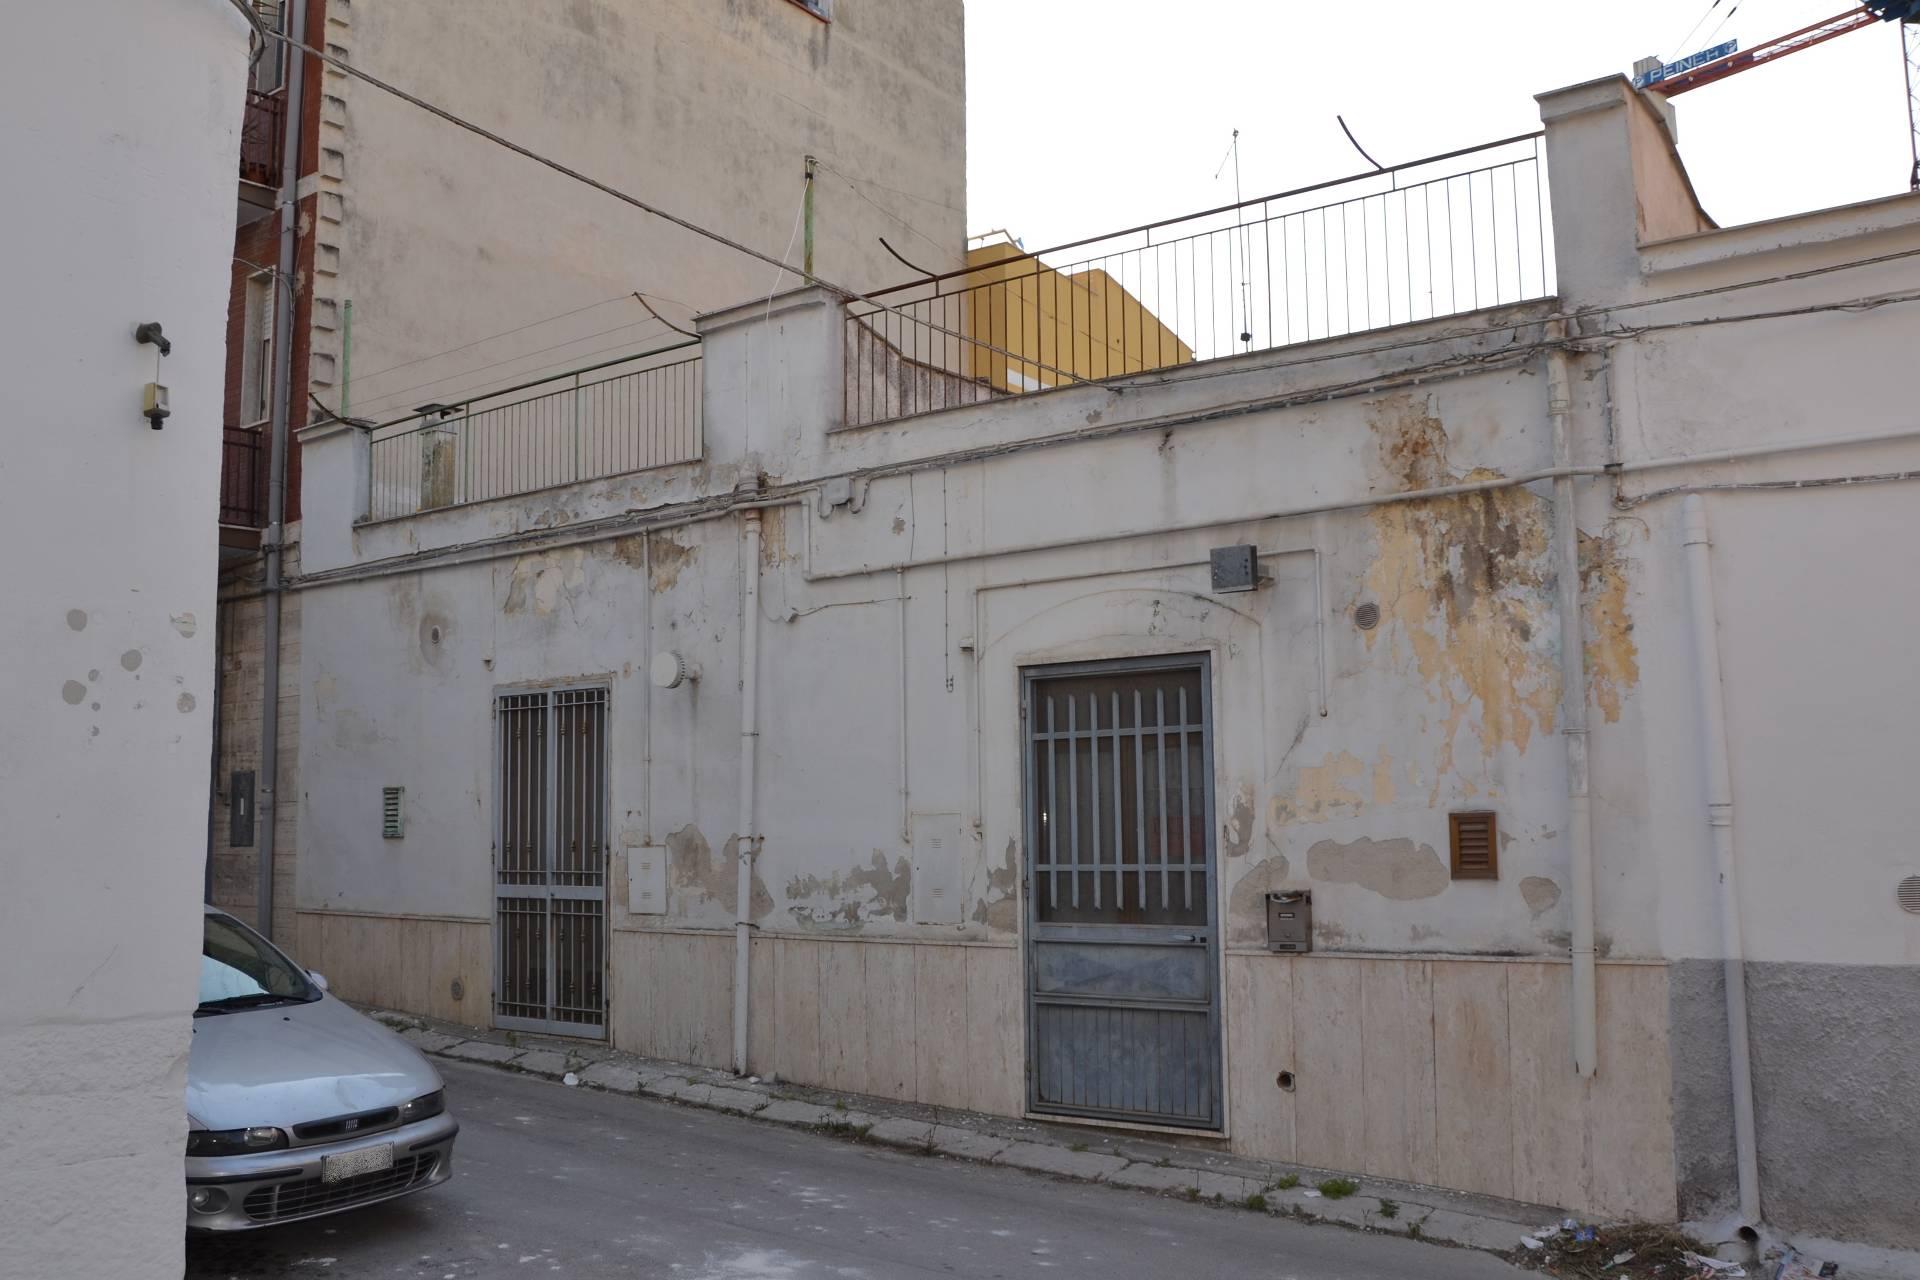 Casa singola in vendita a canosa di puglia cod r476 - Piano casa puglia 2017 ...